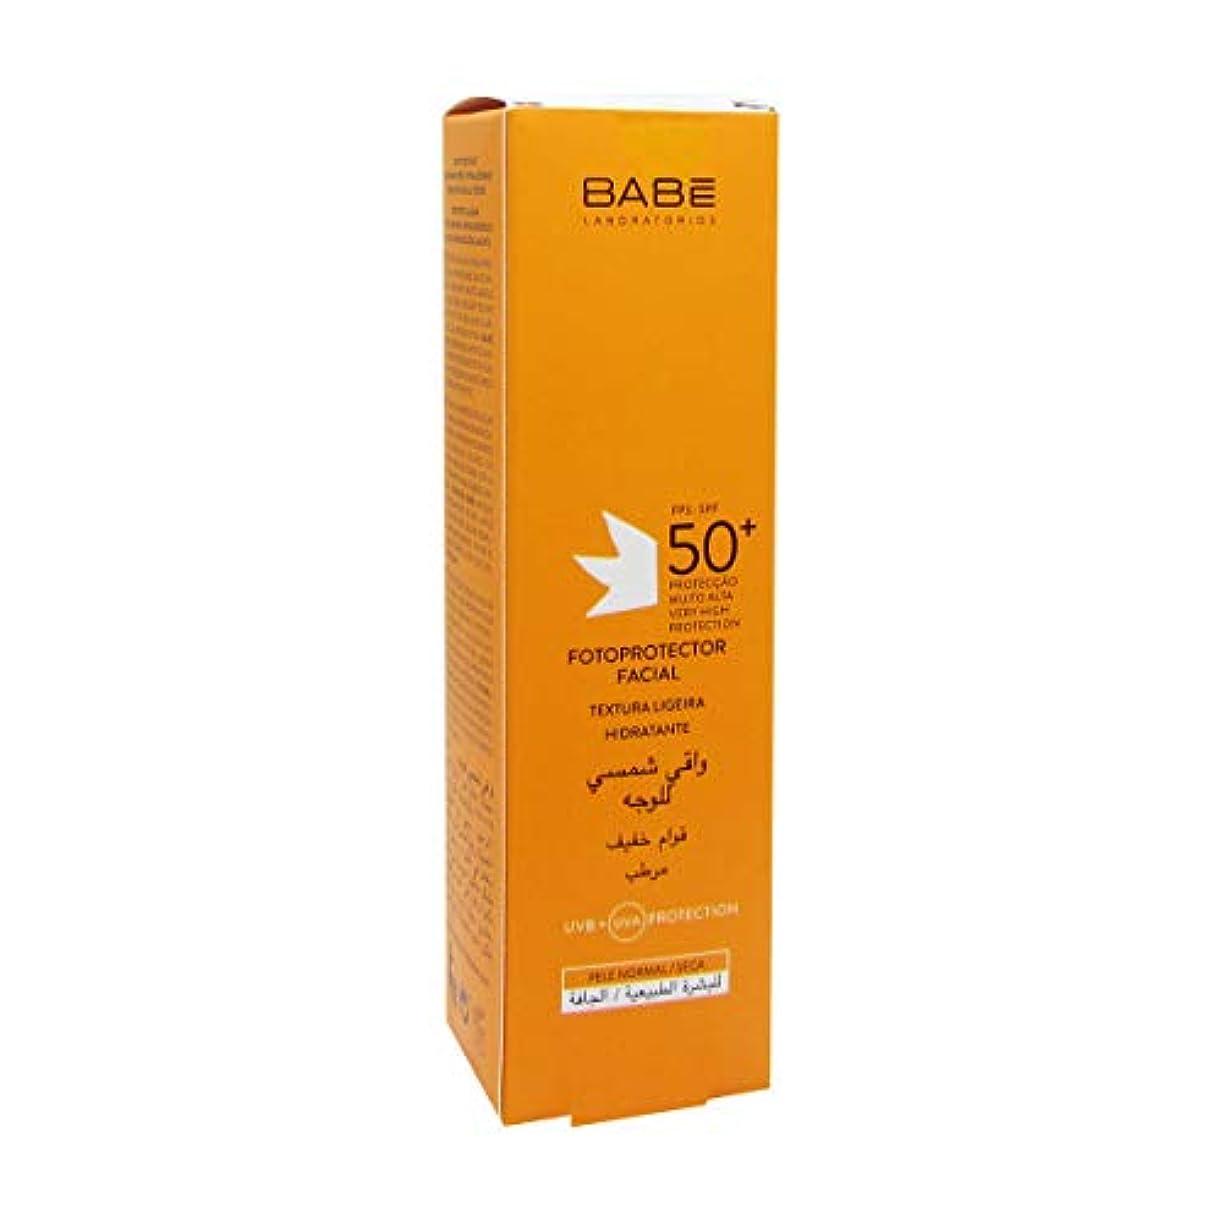 Bab Sun Light Facial Photoprotector Fps50+ 50ml [並行輸入品]